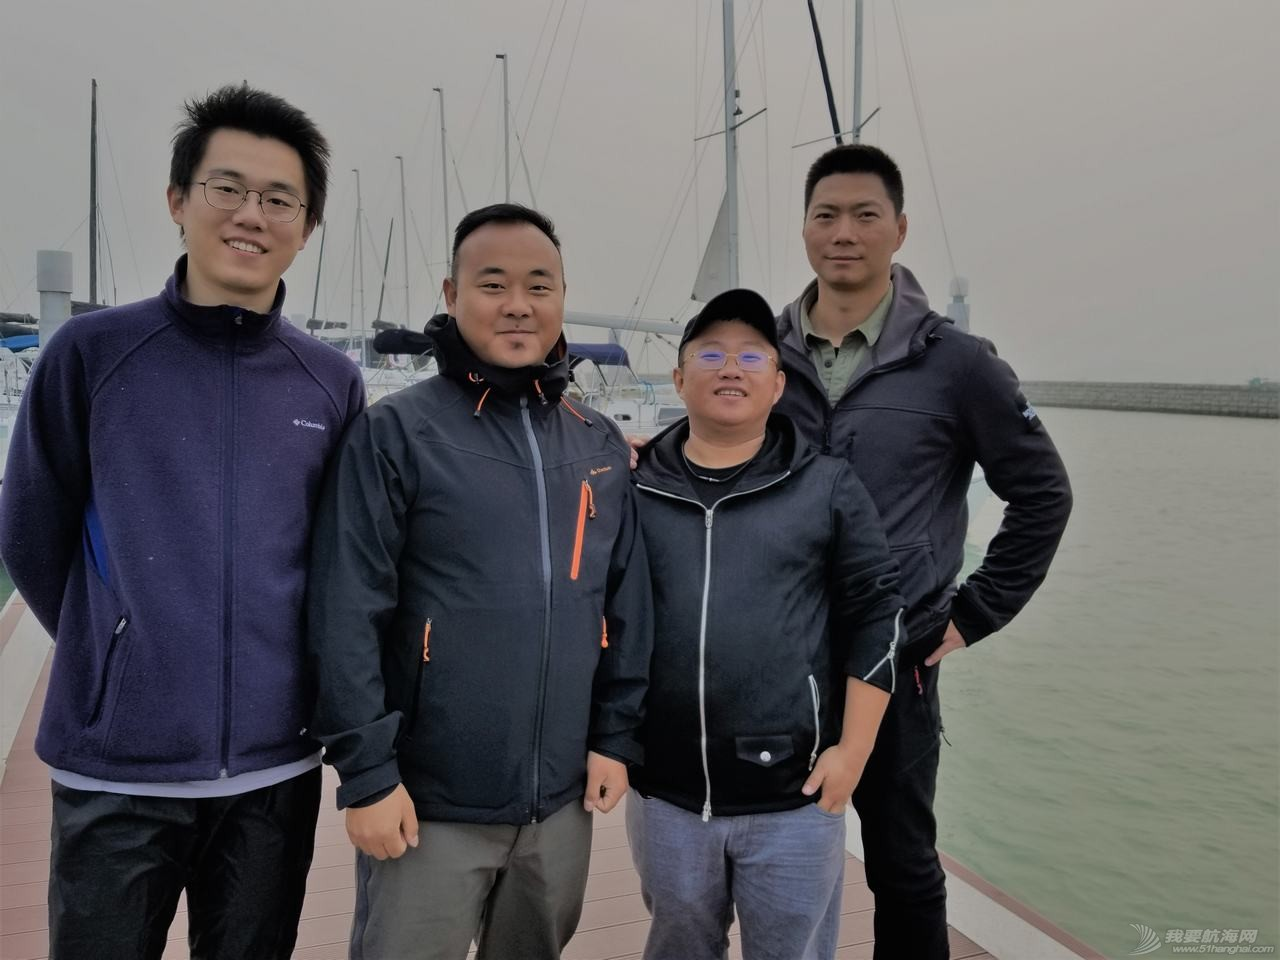 nbsp,到了,航海,我们,帆船 人生中的第一次--2017环太湖帆船赛  234014gssjovqk2kownuno